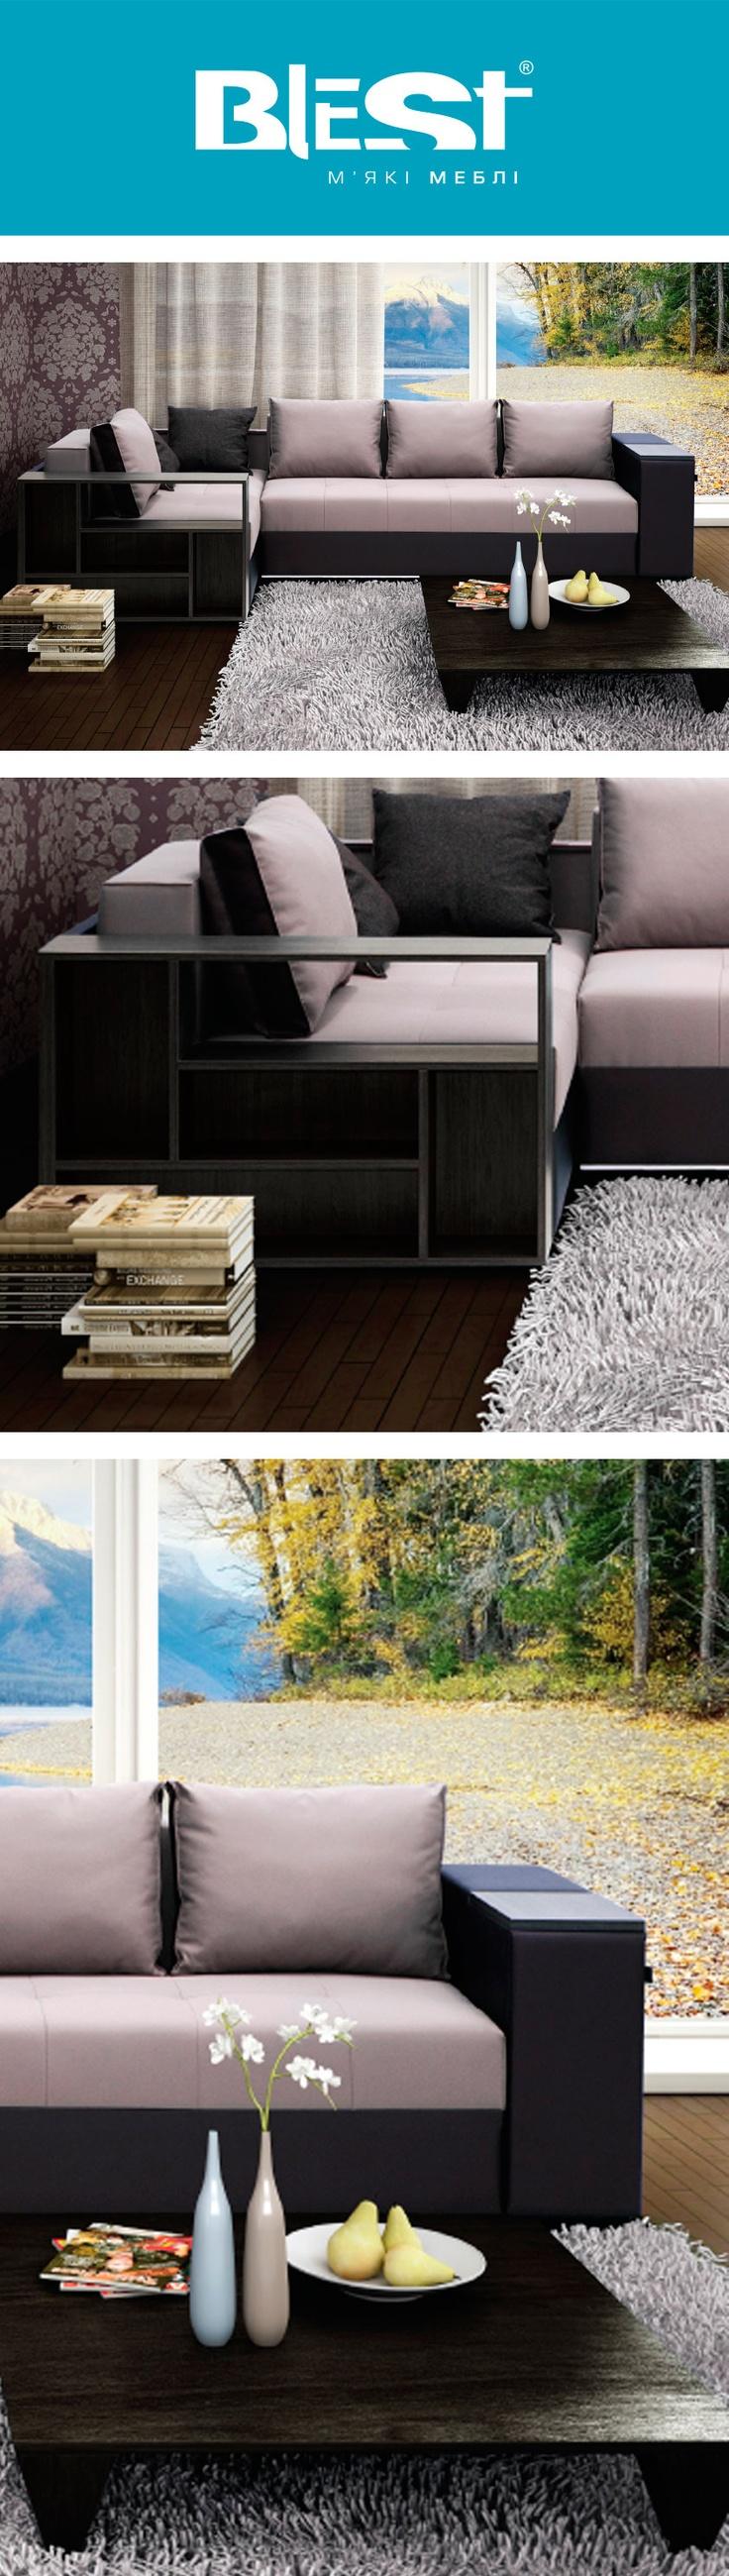 Stylish Sofas 119 Best Stylish Sofas Images On Pinterest Live Living Spaces